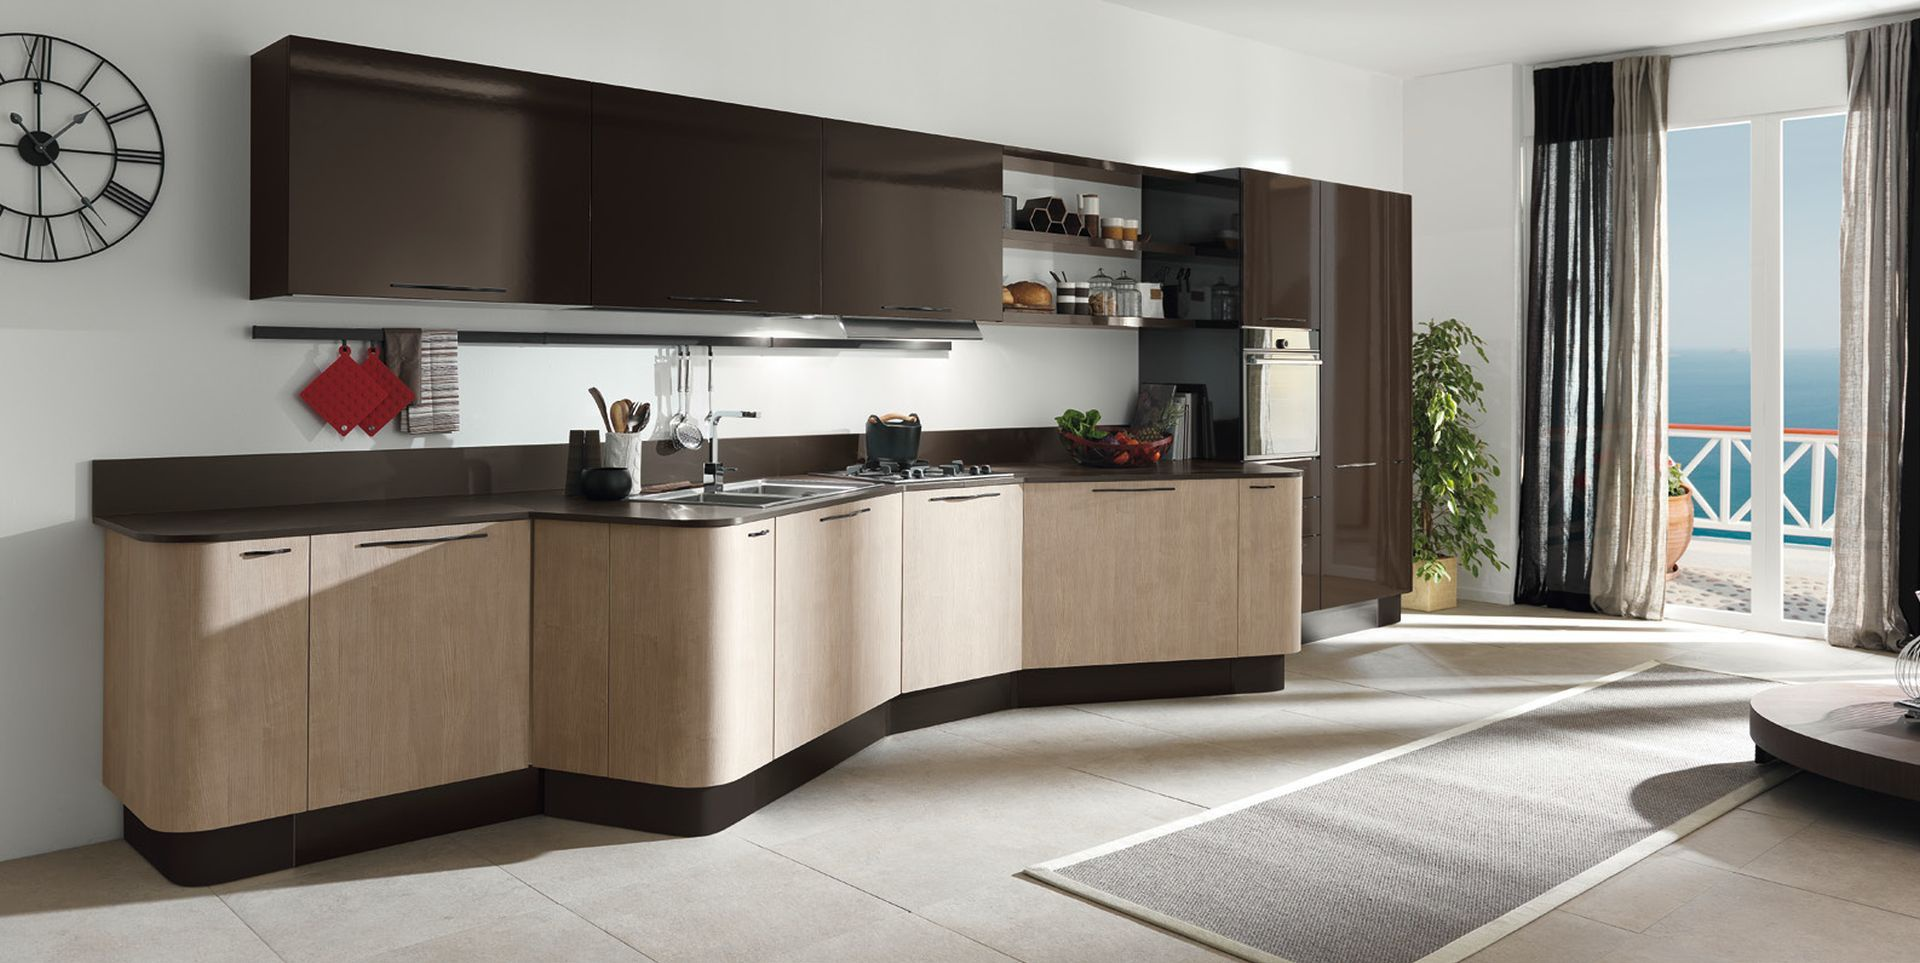 System mebli kuchennych kuchnia na lata ponadczasowe - Cucine lussuose moderne ...